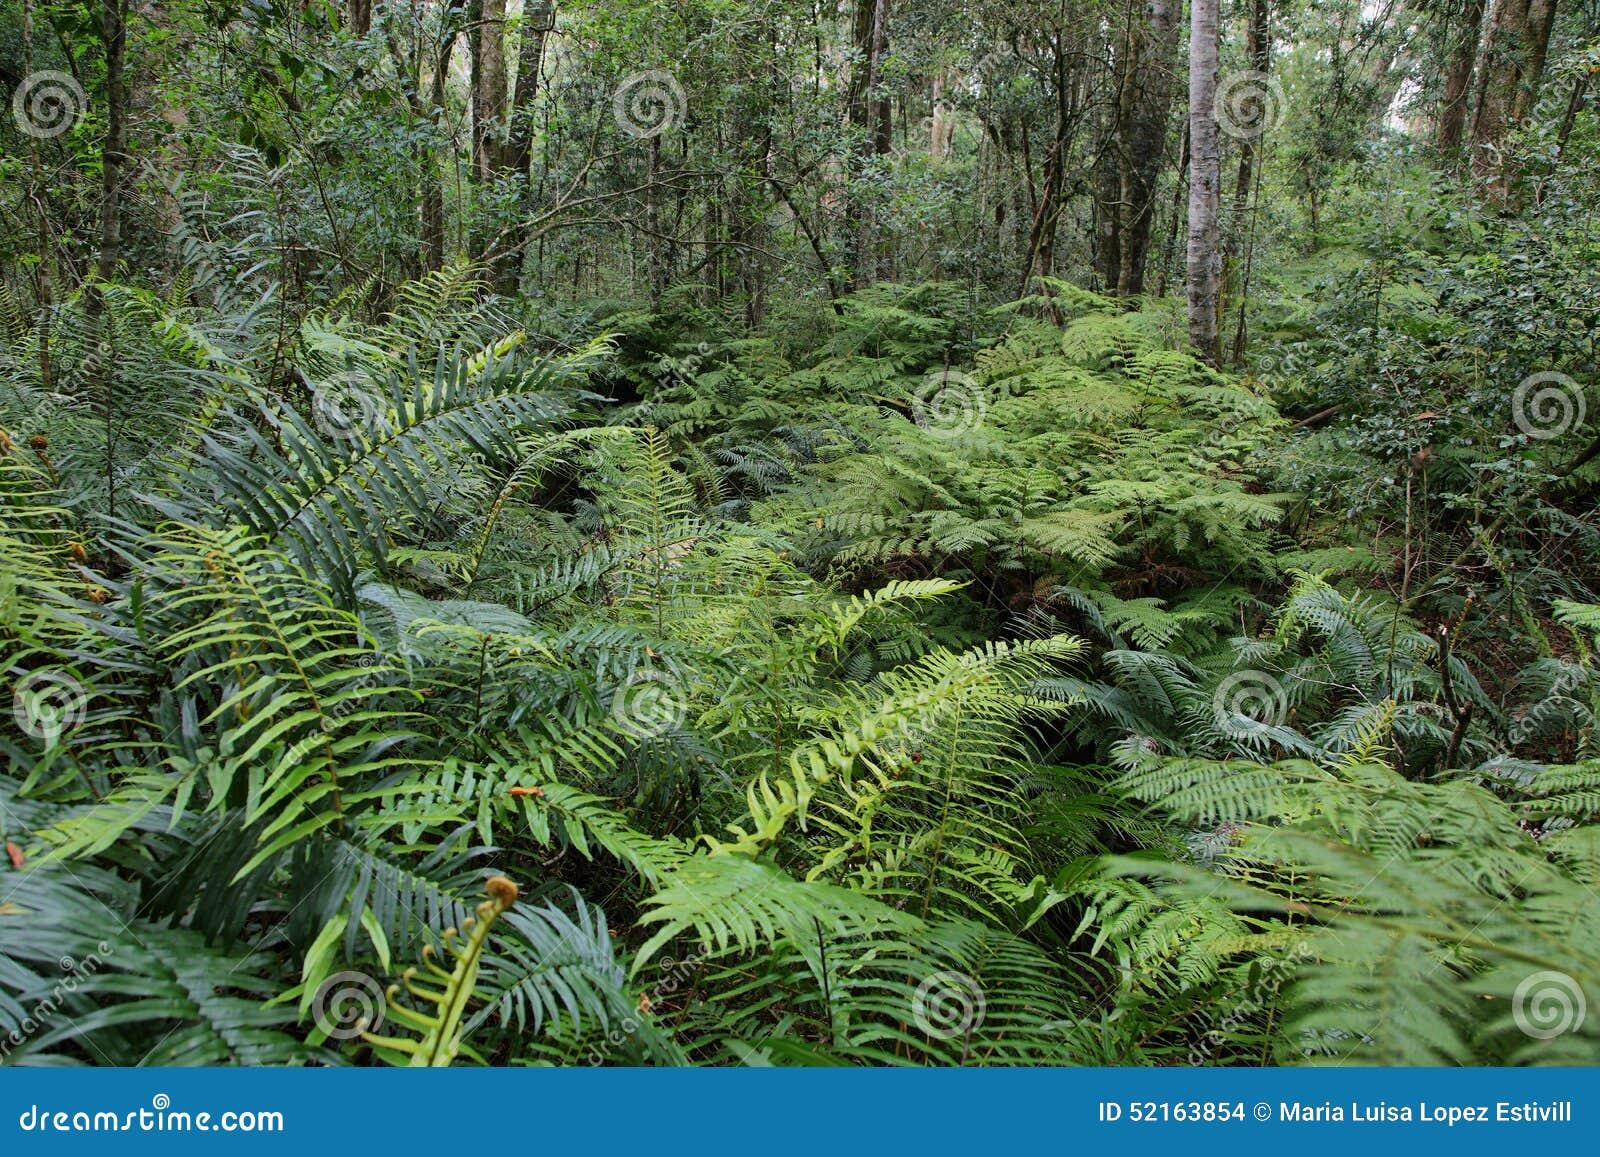 Garden Of Eden Stock Photo Image Of Park Landscape 52163854